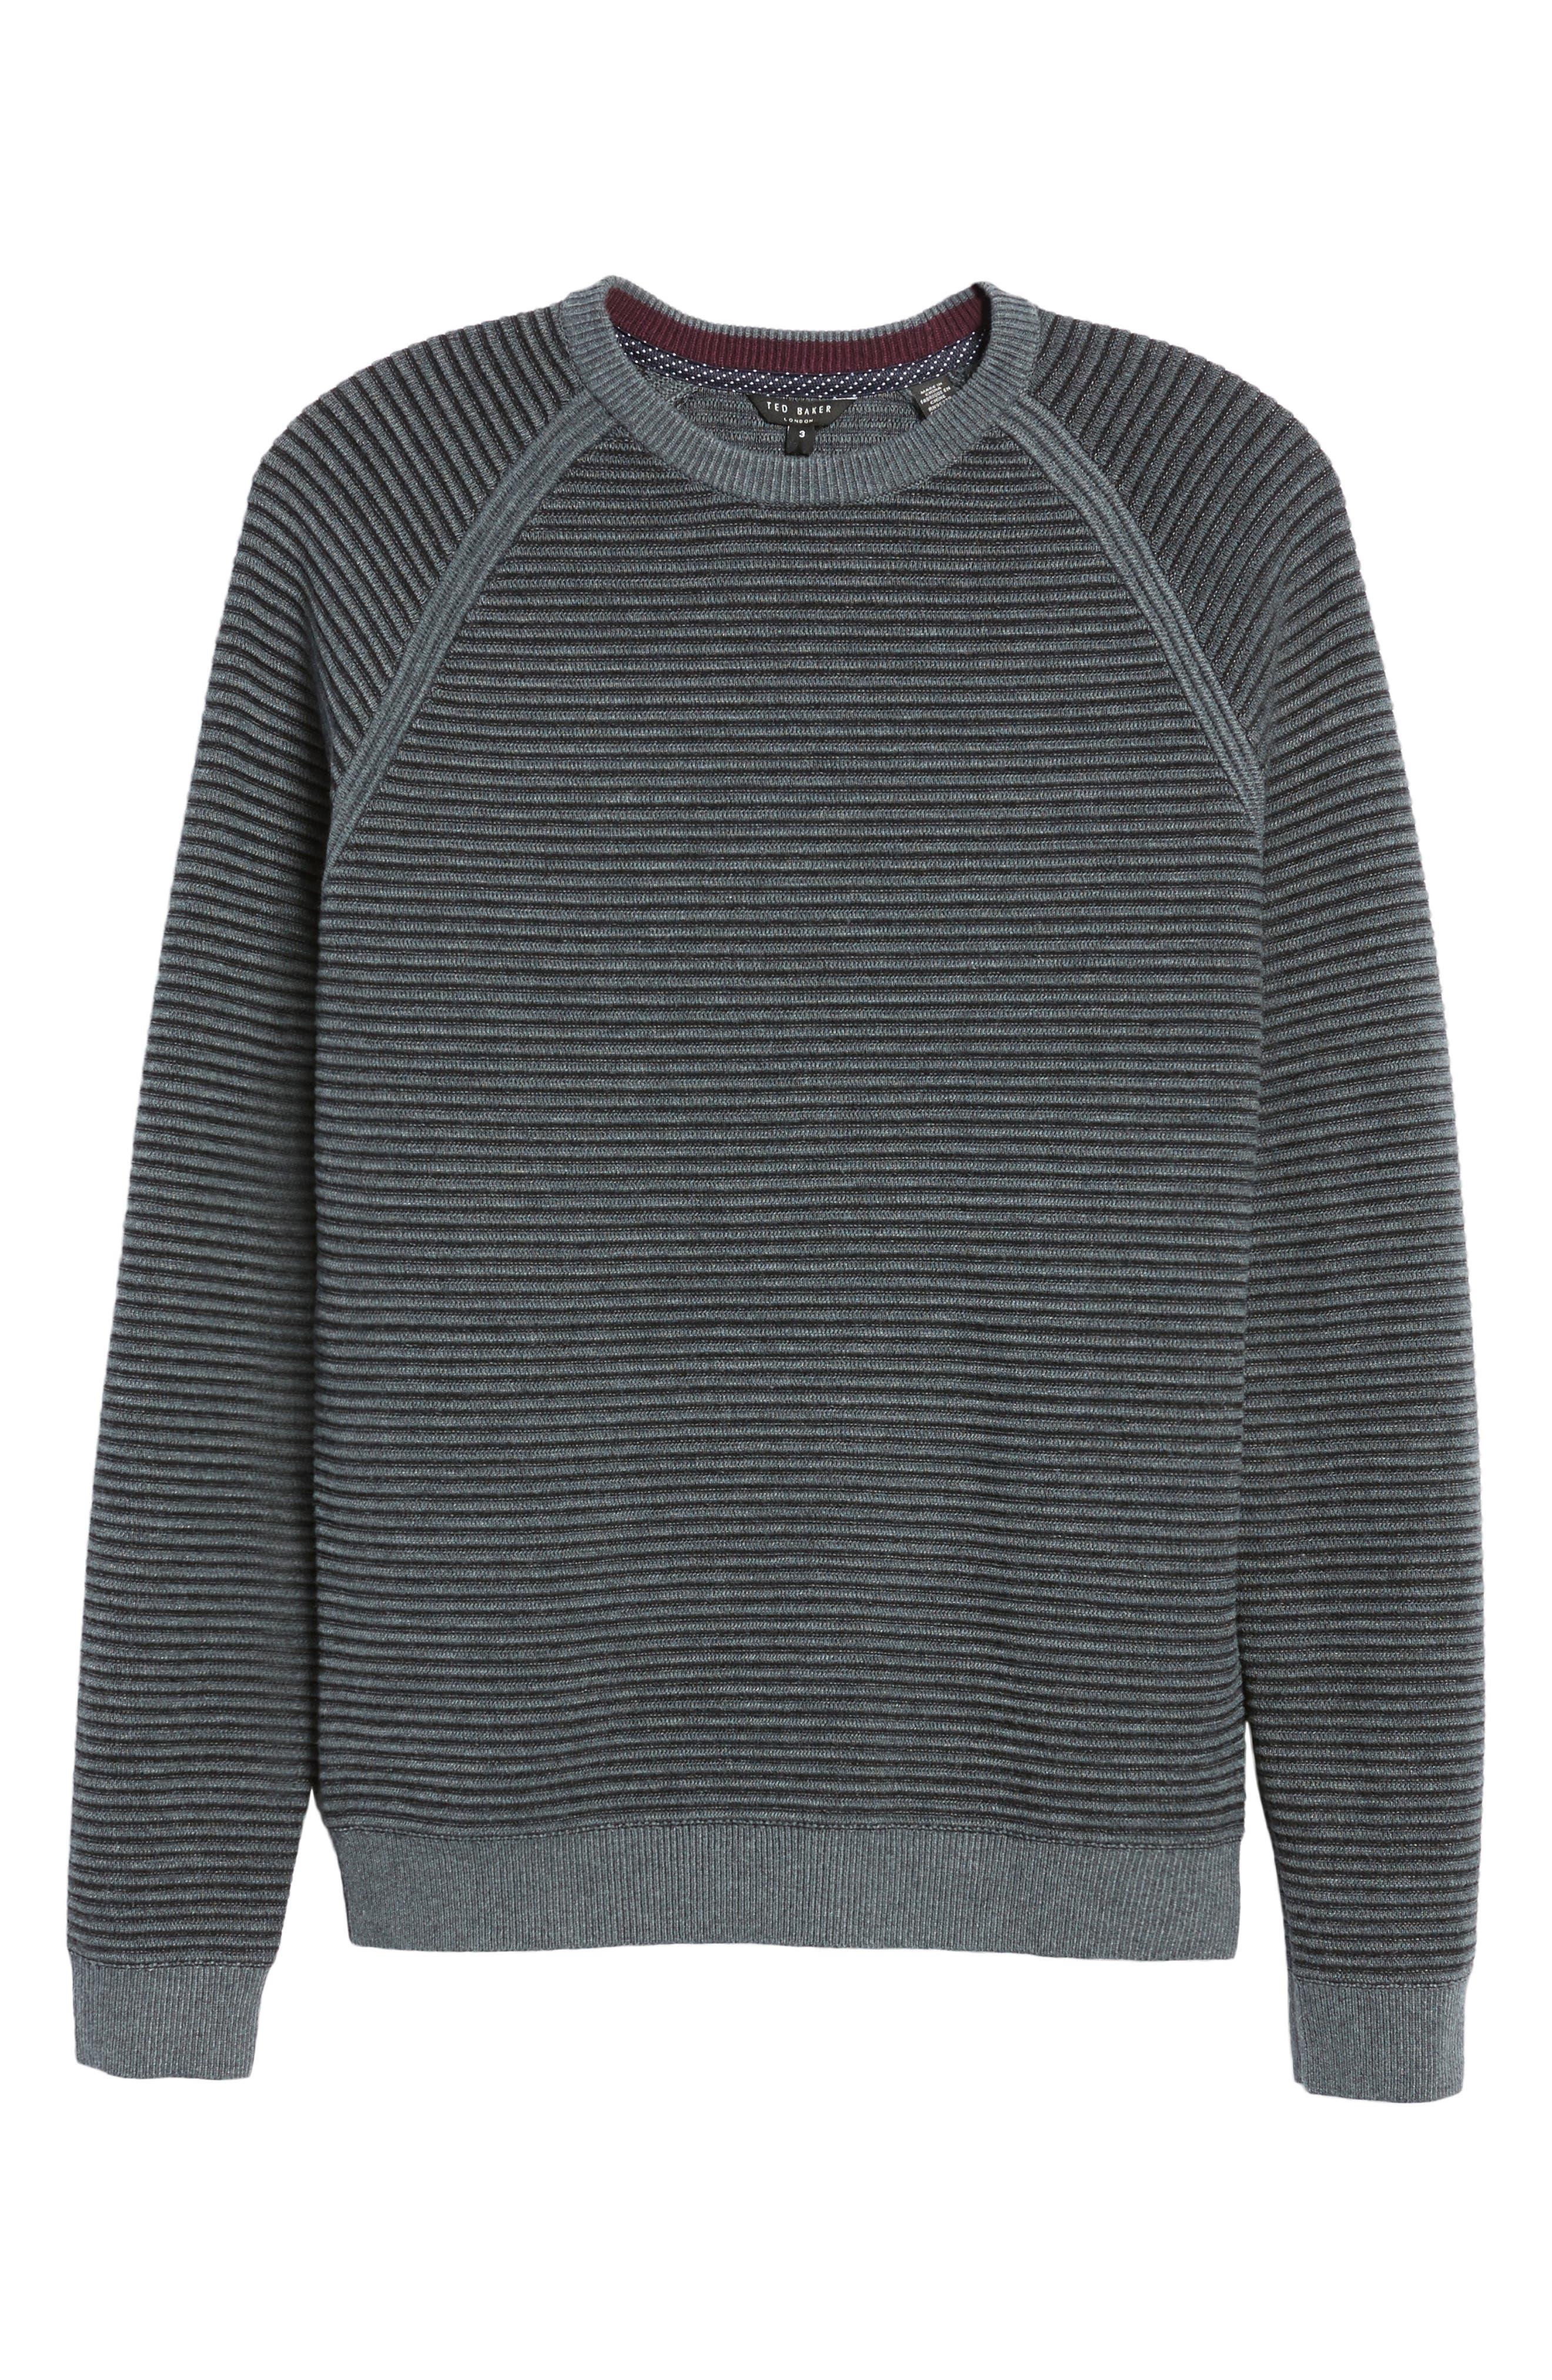 Cashoo Slim Fit Ribbed Sweatshirt,                             Alternate thumbnail 6, color,                             030